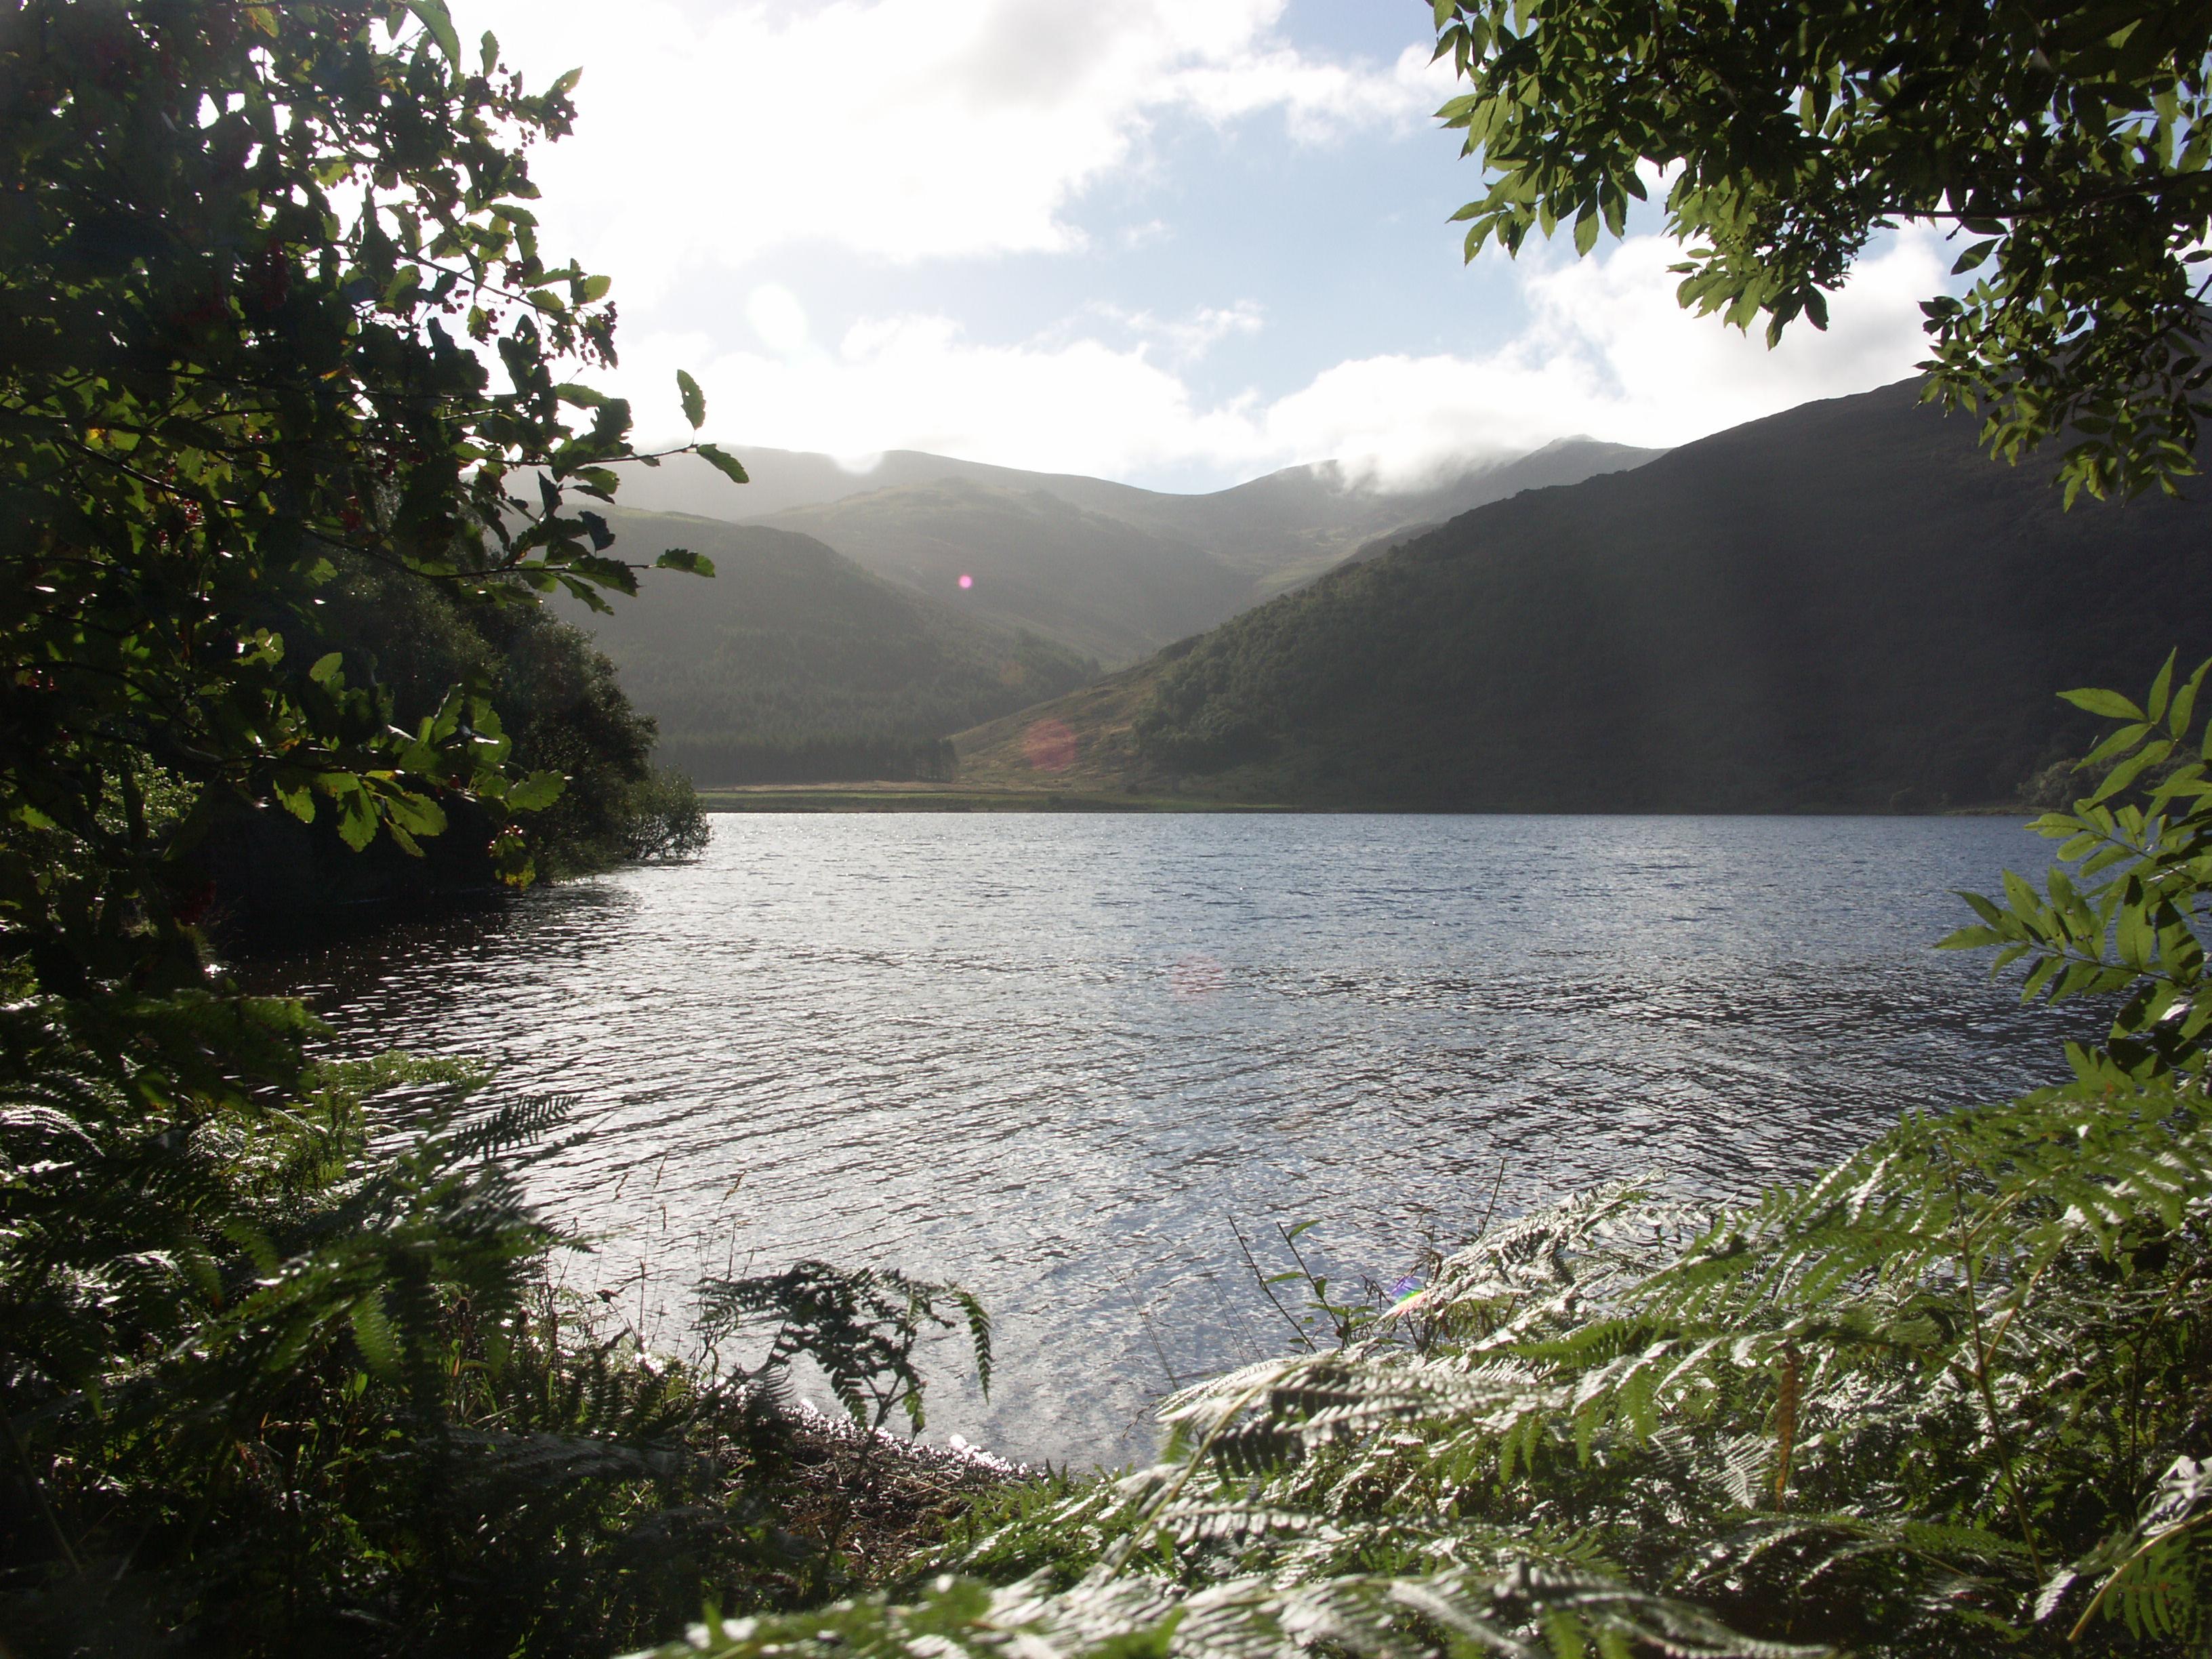 Ennerdale Water, Lake District. (photo by Ian Winfield)